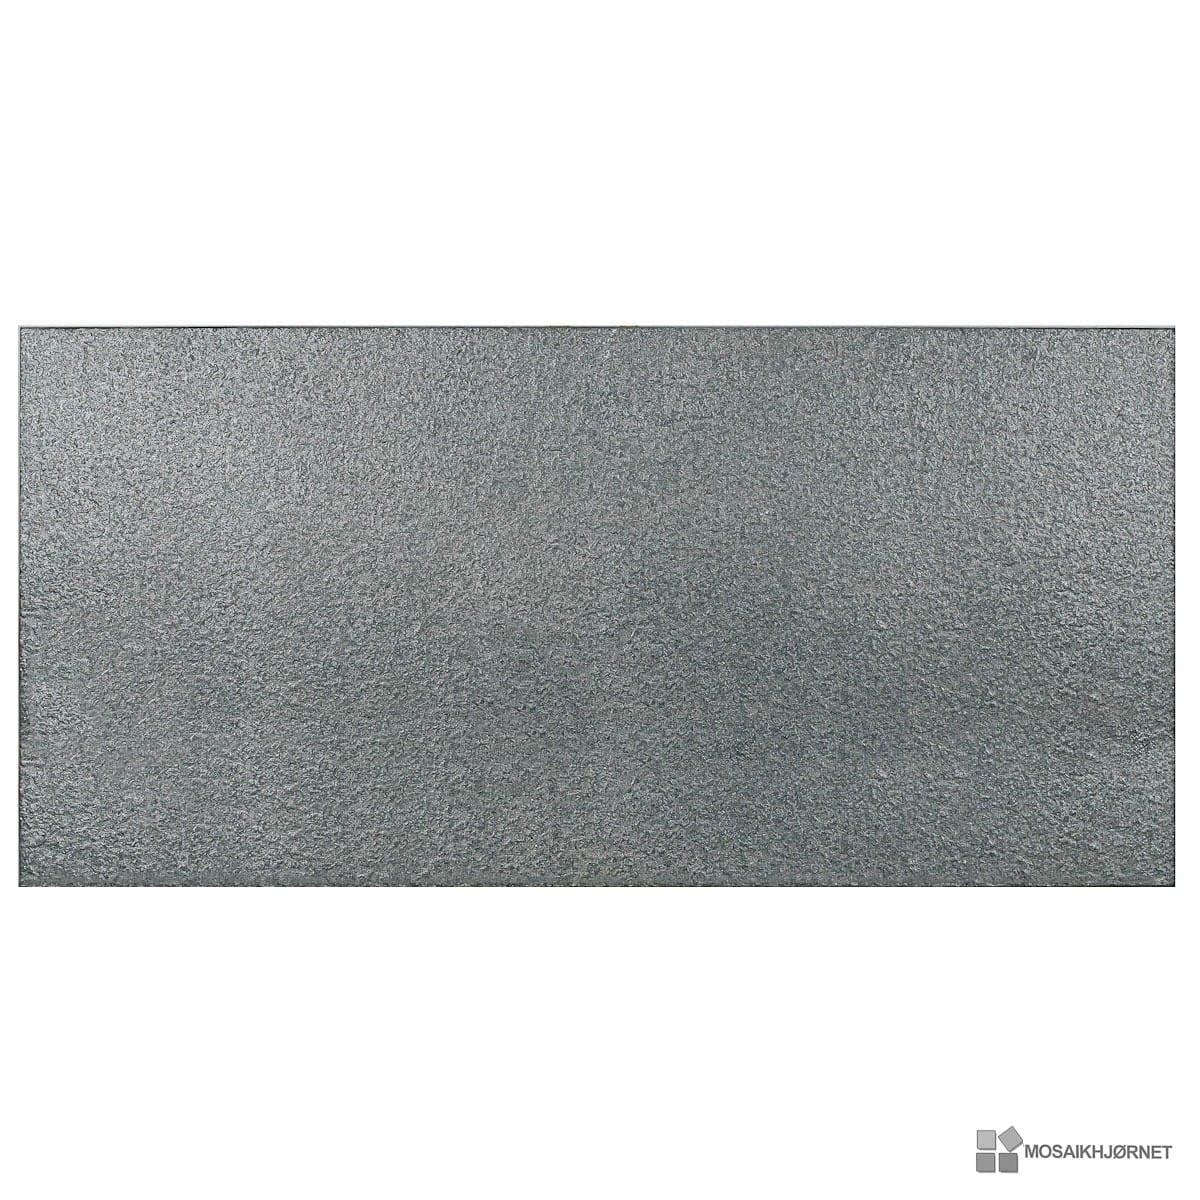 #6E685D Mest effektive Ecostone Antracite 30x60 Mosaikhjørnet Fliser Klinker Og Mosaik Til Bade  Fliser Til Bad Og Køkken 4805 120012004805